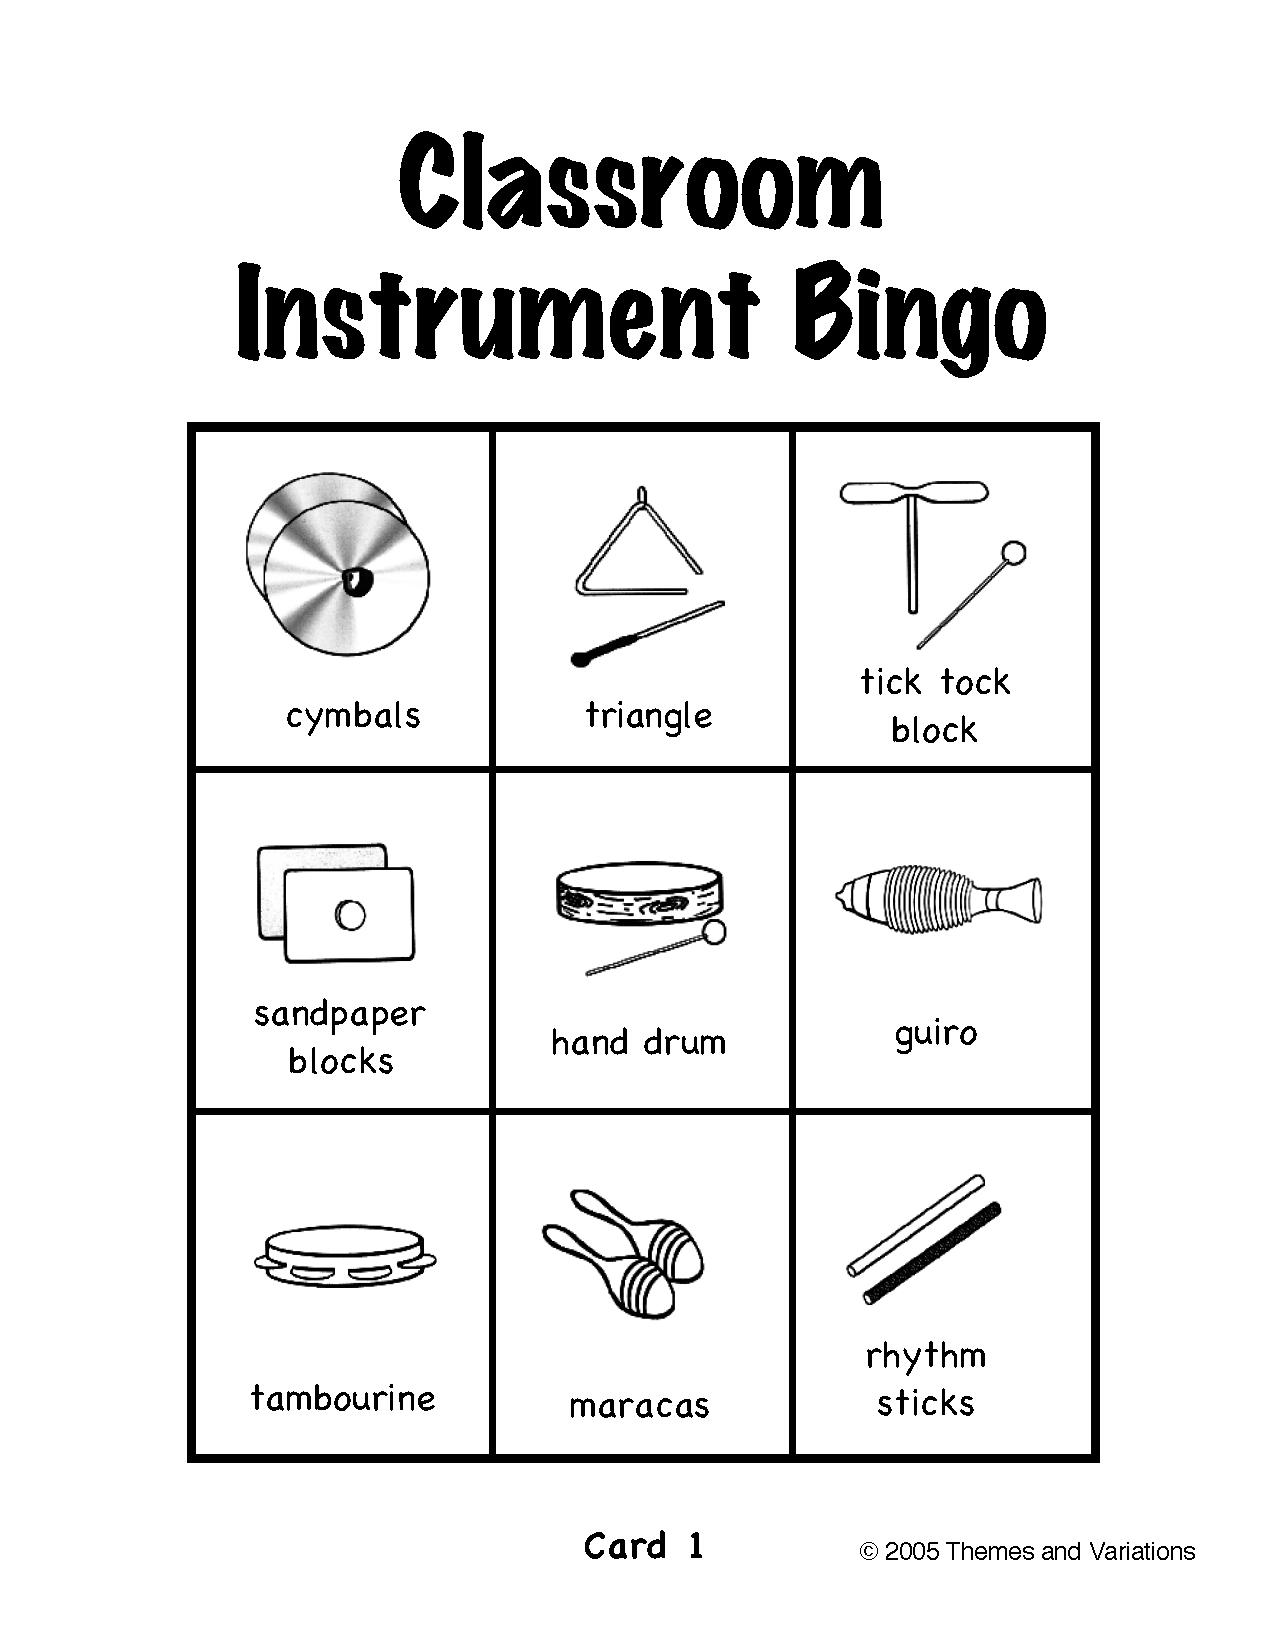 Classroom Instrument Bingo | Elementary Music Class, Drum